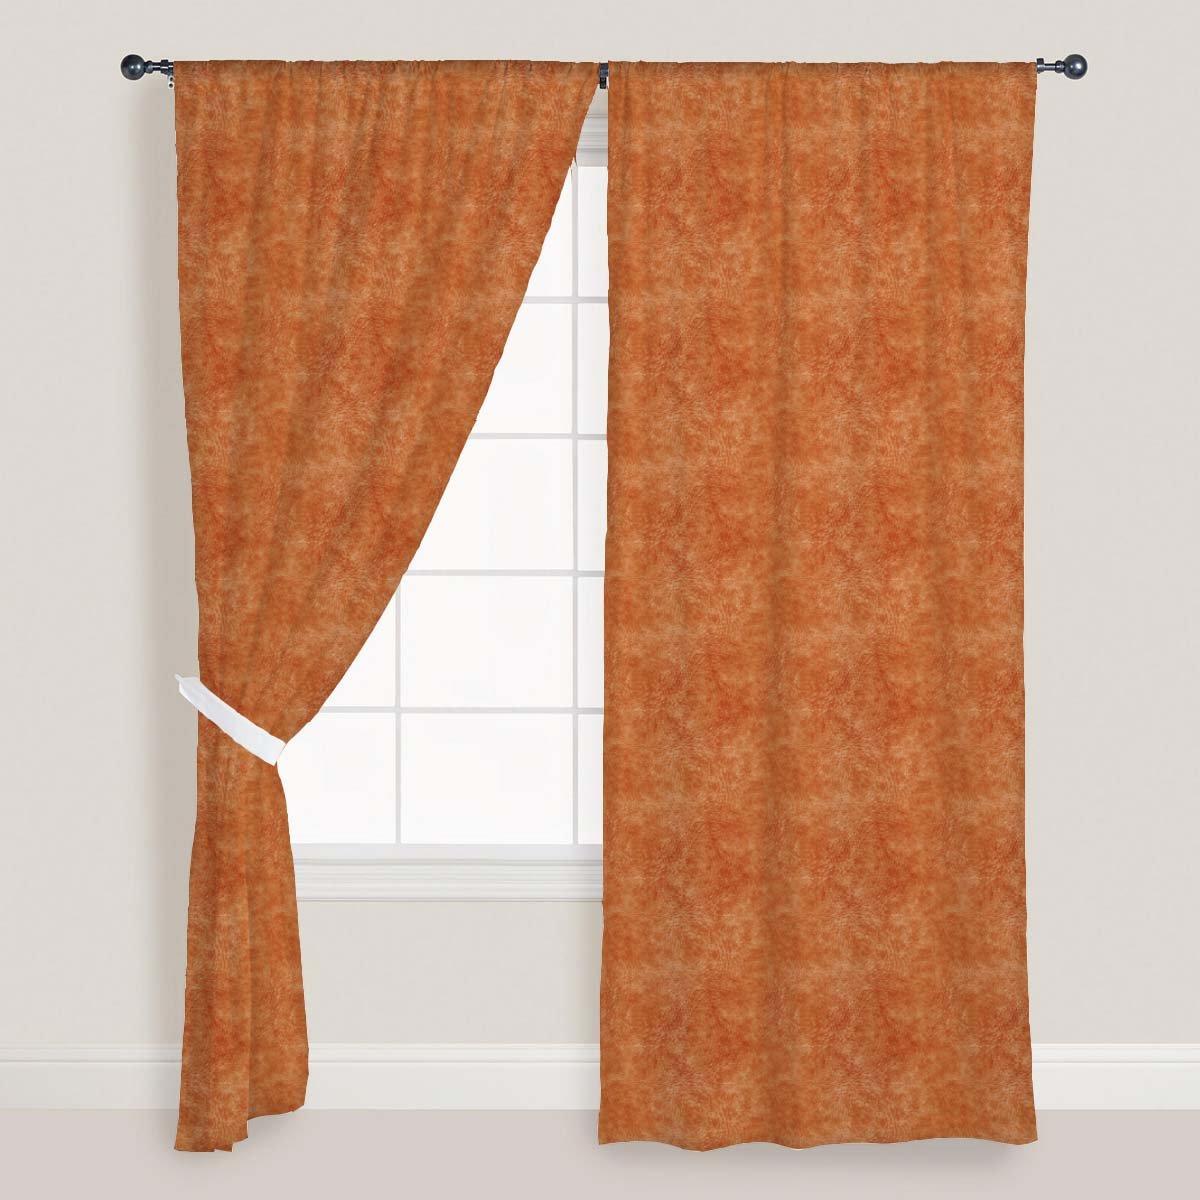 AZ Animal Hide Door & Window Curtain Satin 4feet x 9feet; SET OF 3 PCS